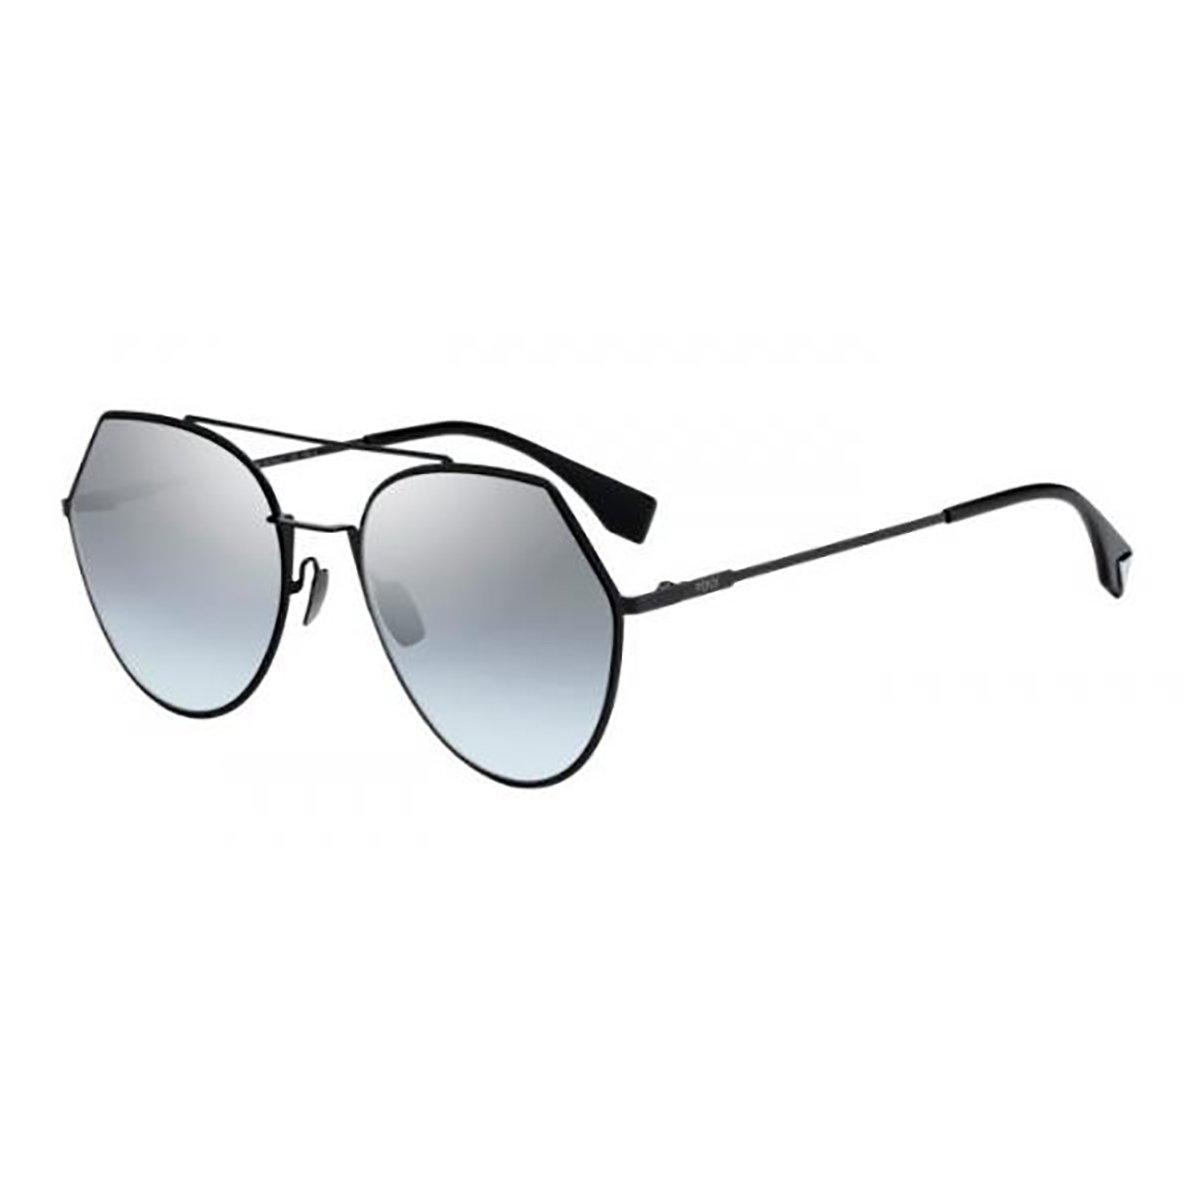 d1dd274637be6 Compre Óculos de Sol Fendi Eyeline em 10X